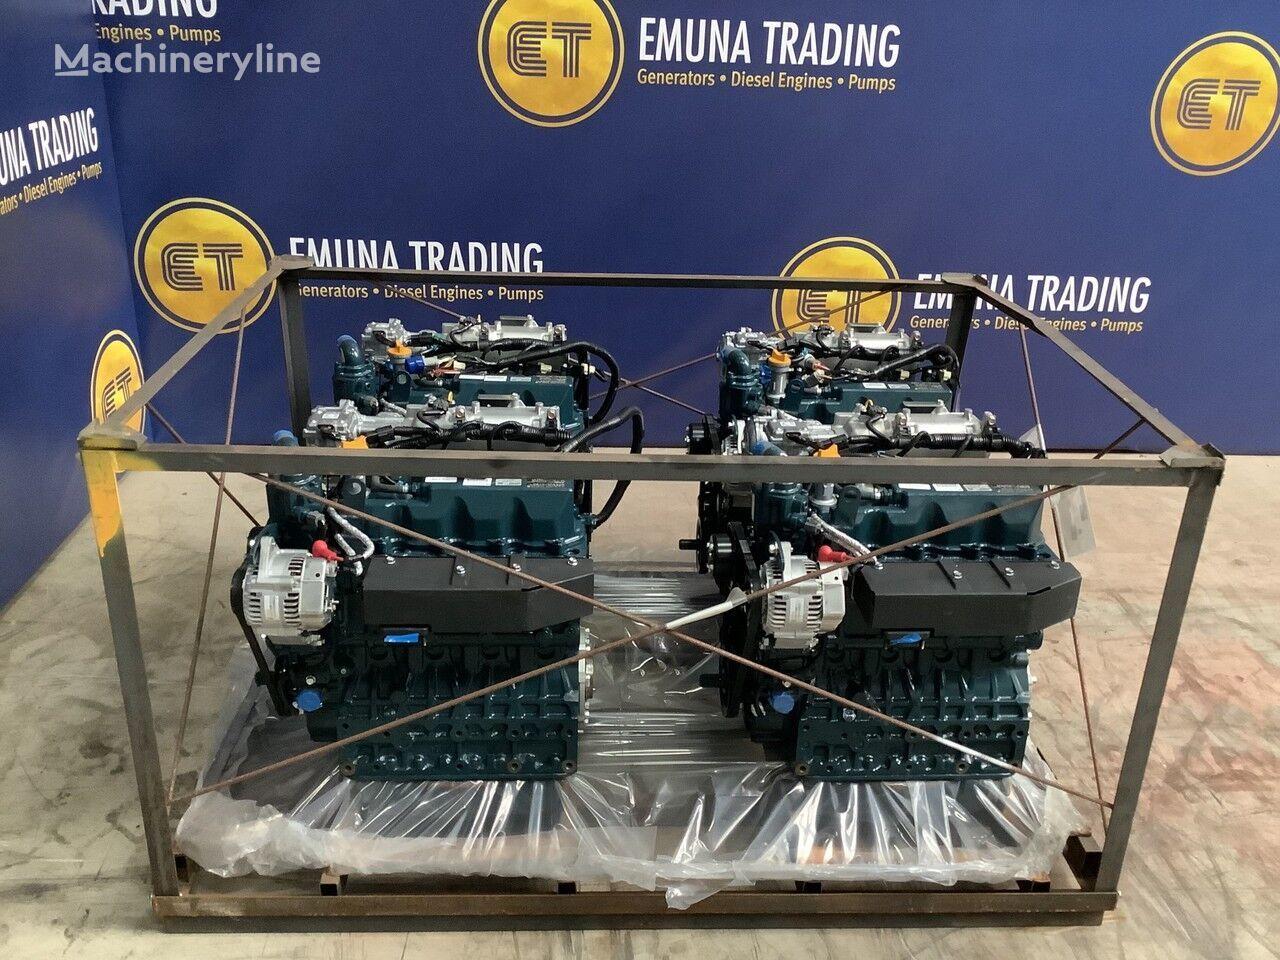 KUBOTA WG2503 motor para carretilla elevadora nuevo